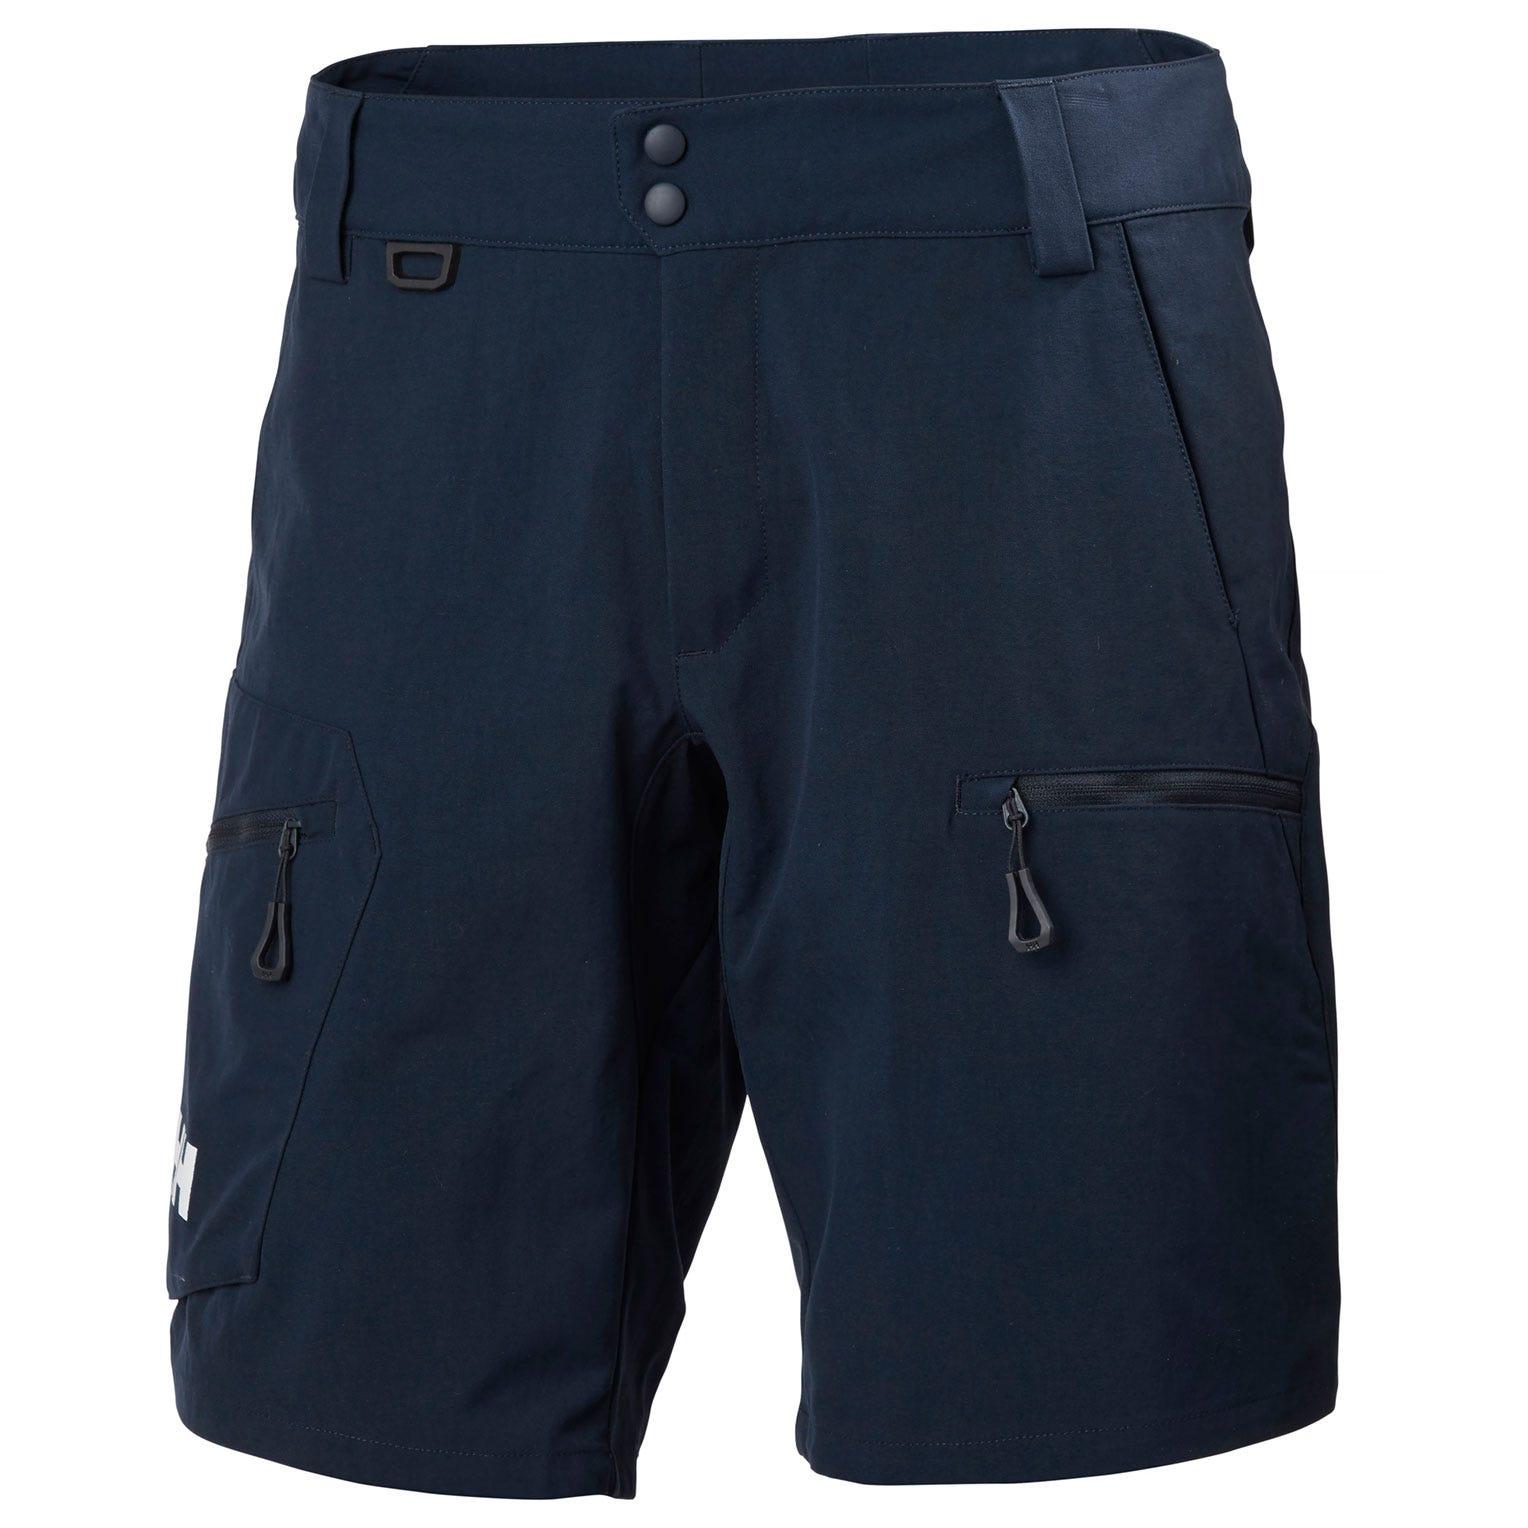 Helly Hansen Crewline Cargo Shorts Mens Sailing Pant Navy 33